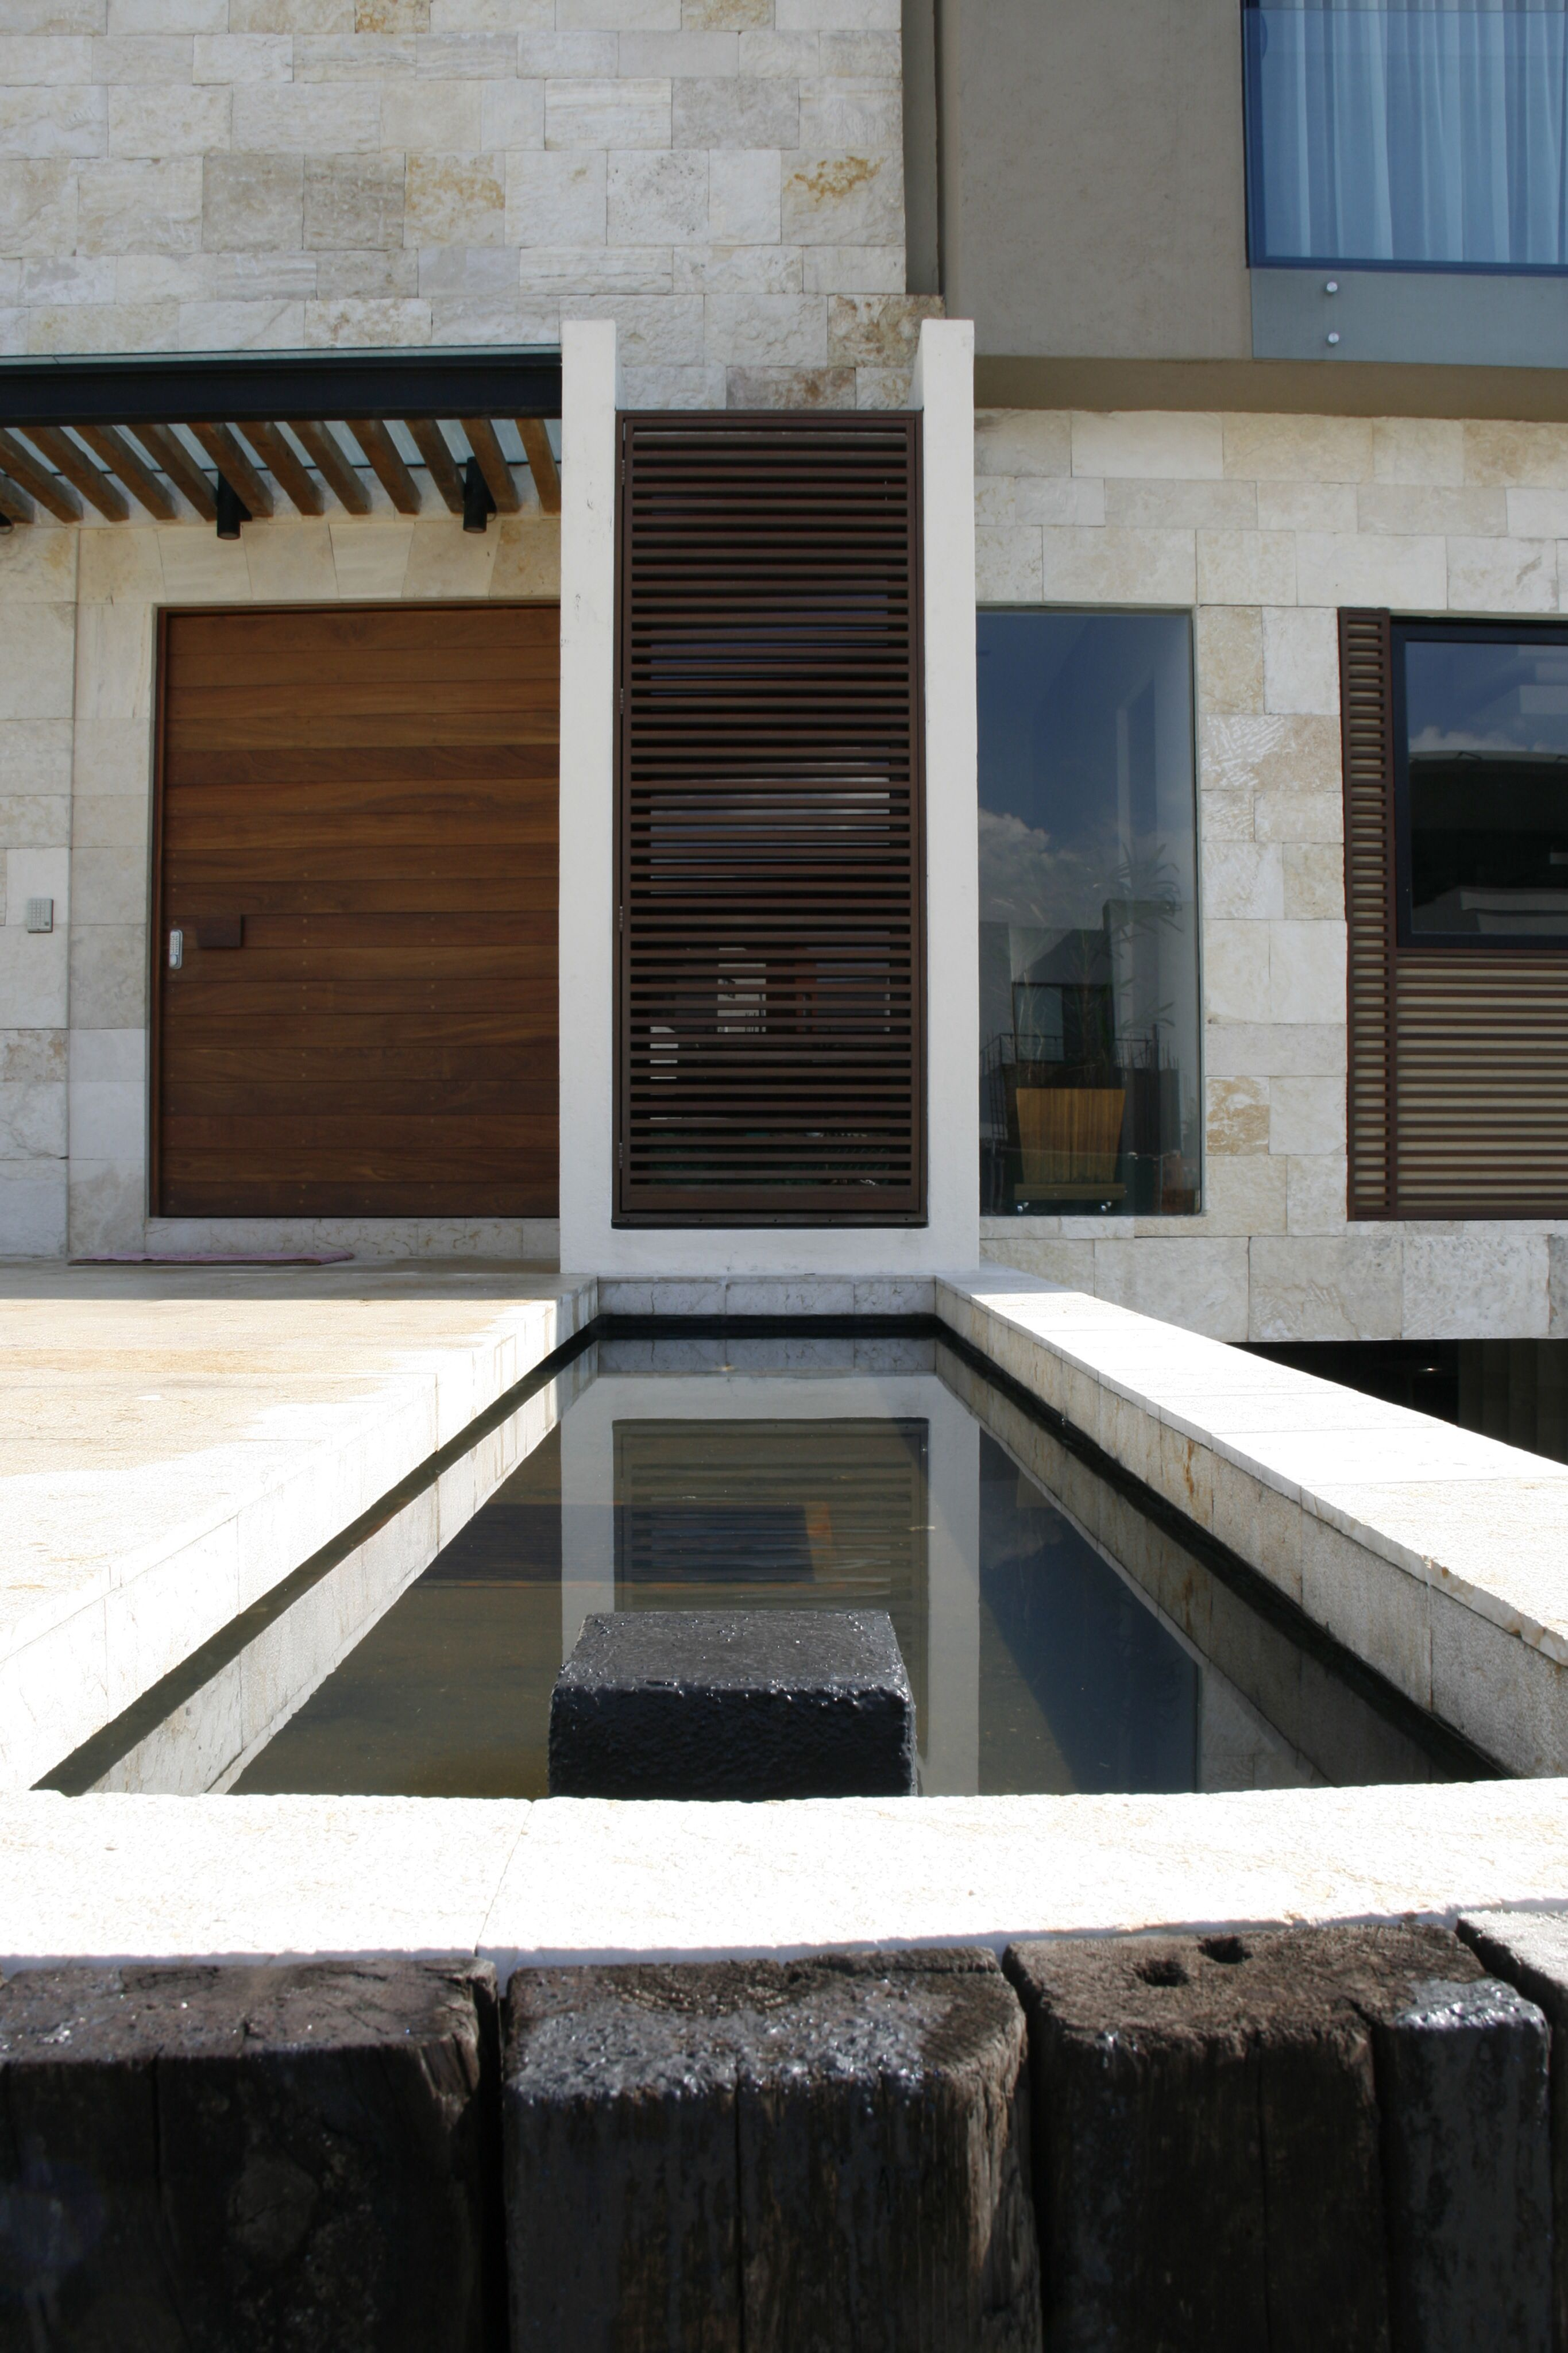 Peque a vivienda estilo tradicional exteriores r sticos e for Fachadas de casas modernas entre medianeras